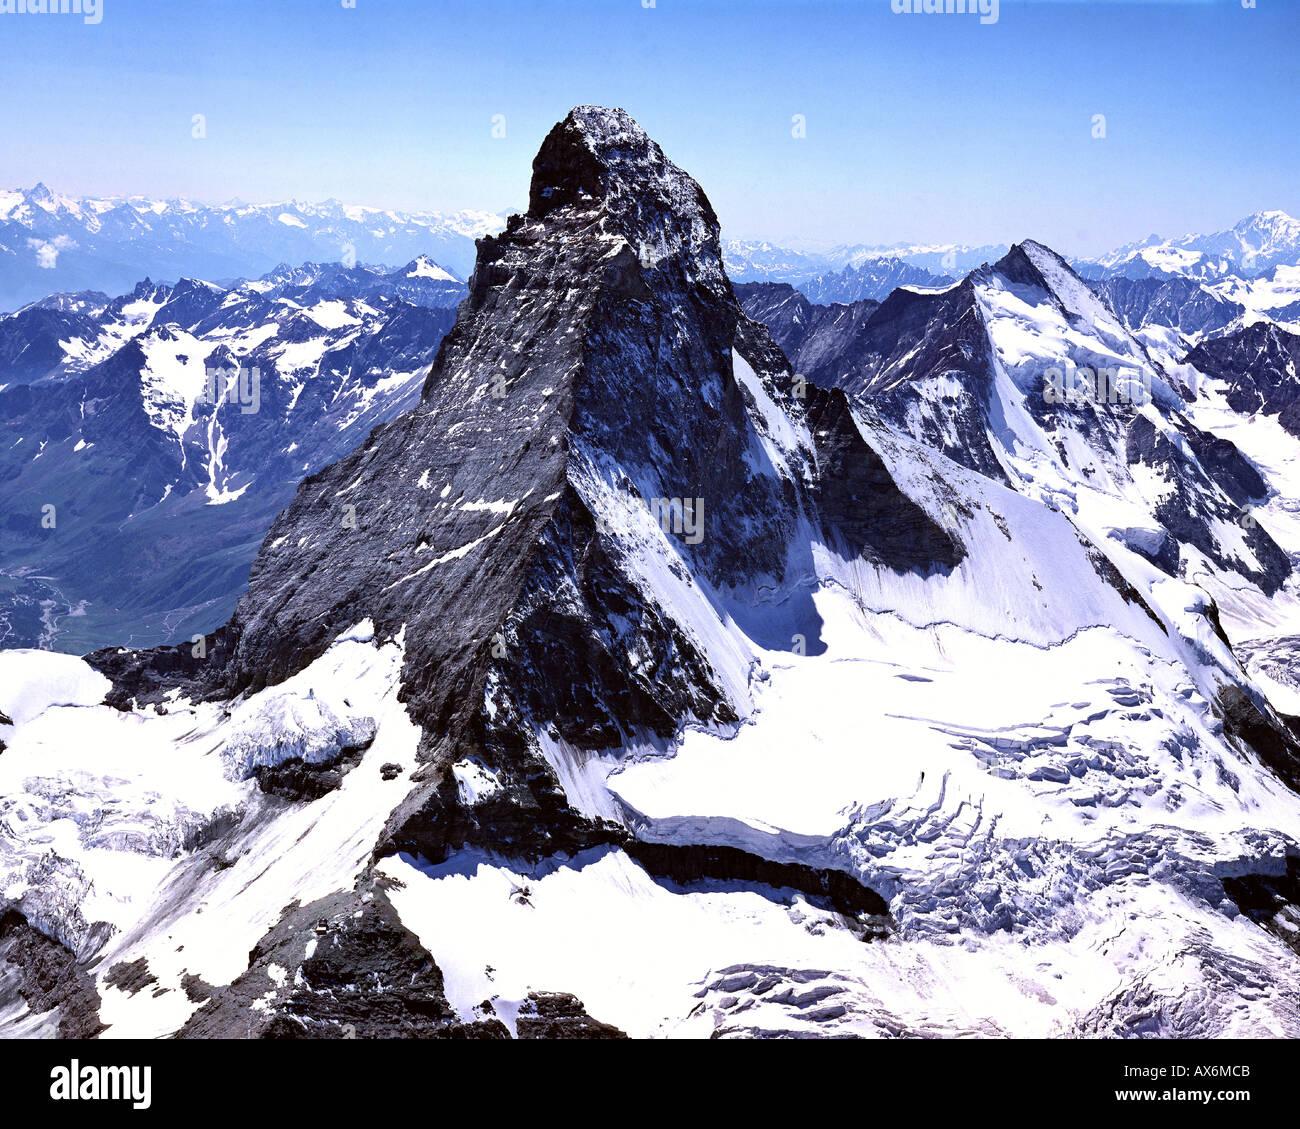 CH - VALAIS:  The Matterhorn from the air - Stock Image